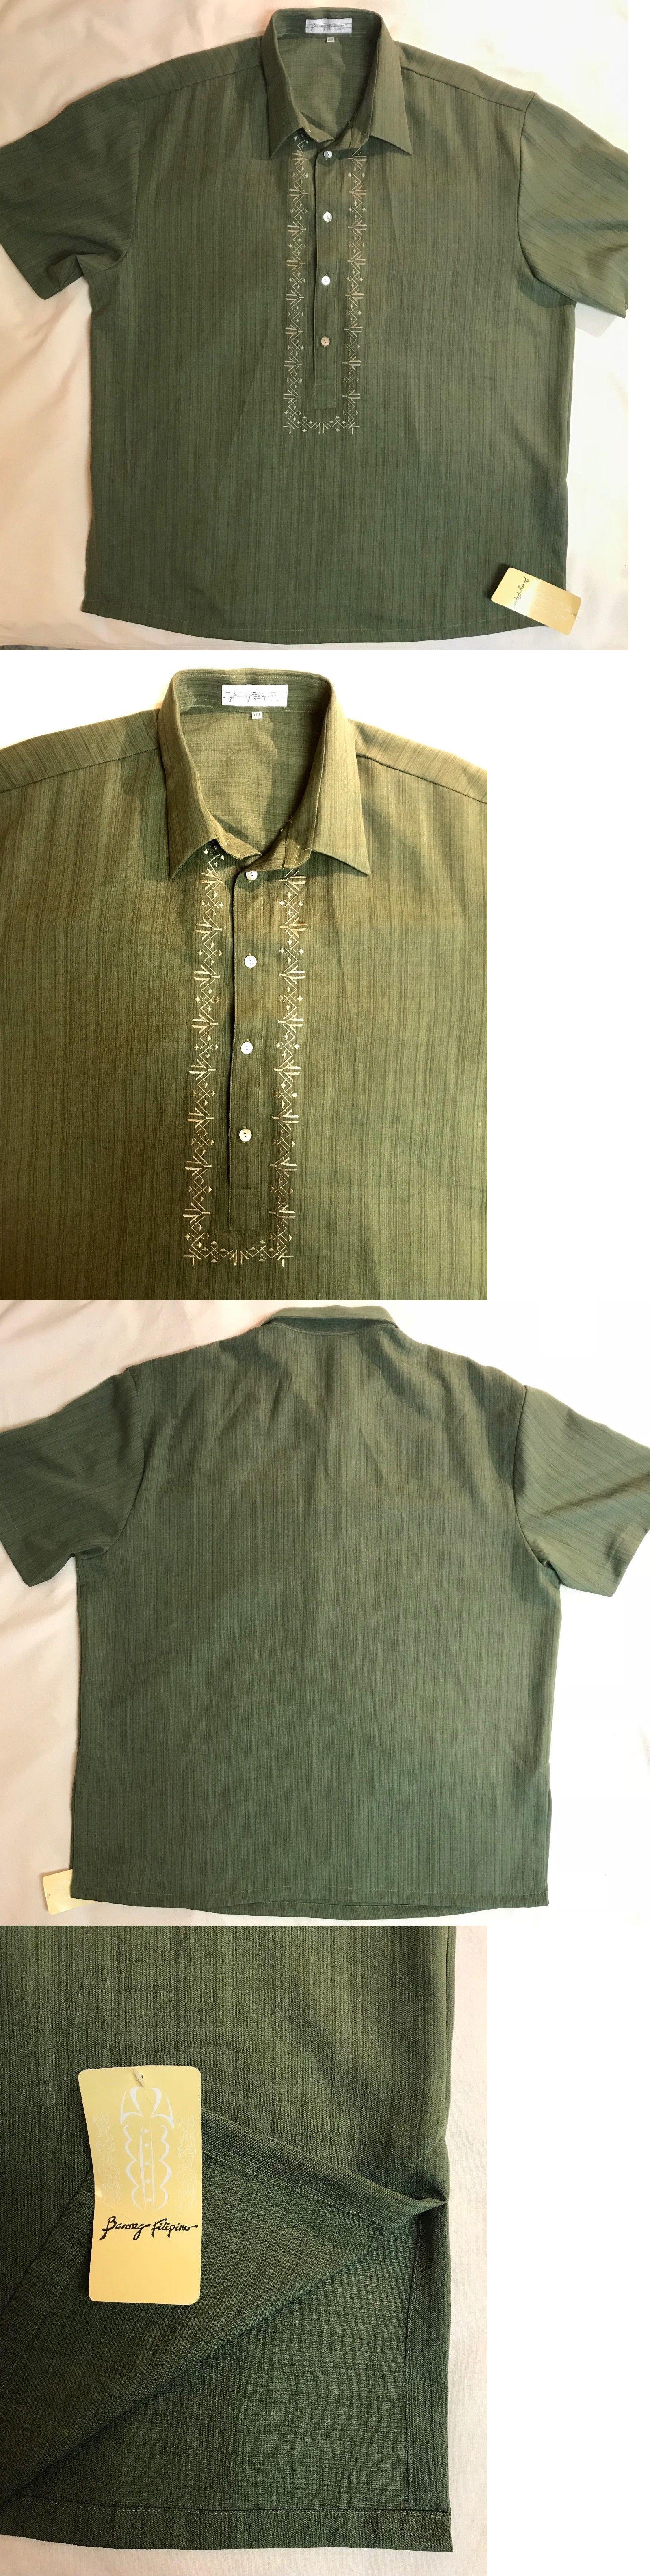 Wedding dress shirts for men  Barong filipino en weddingdress shirt  menus xl  embroidered